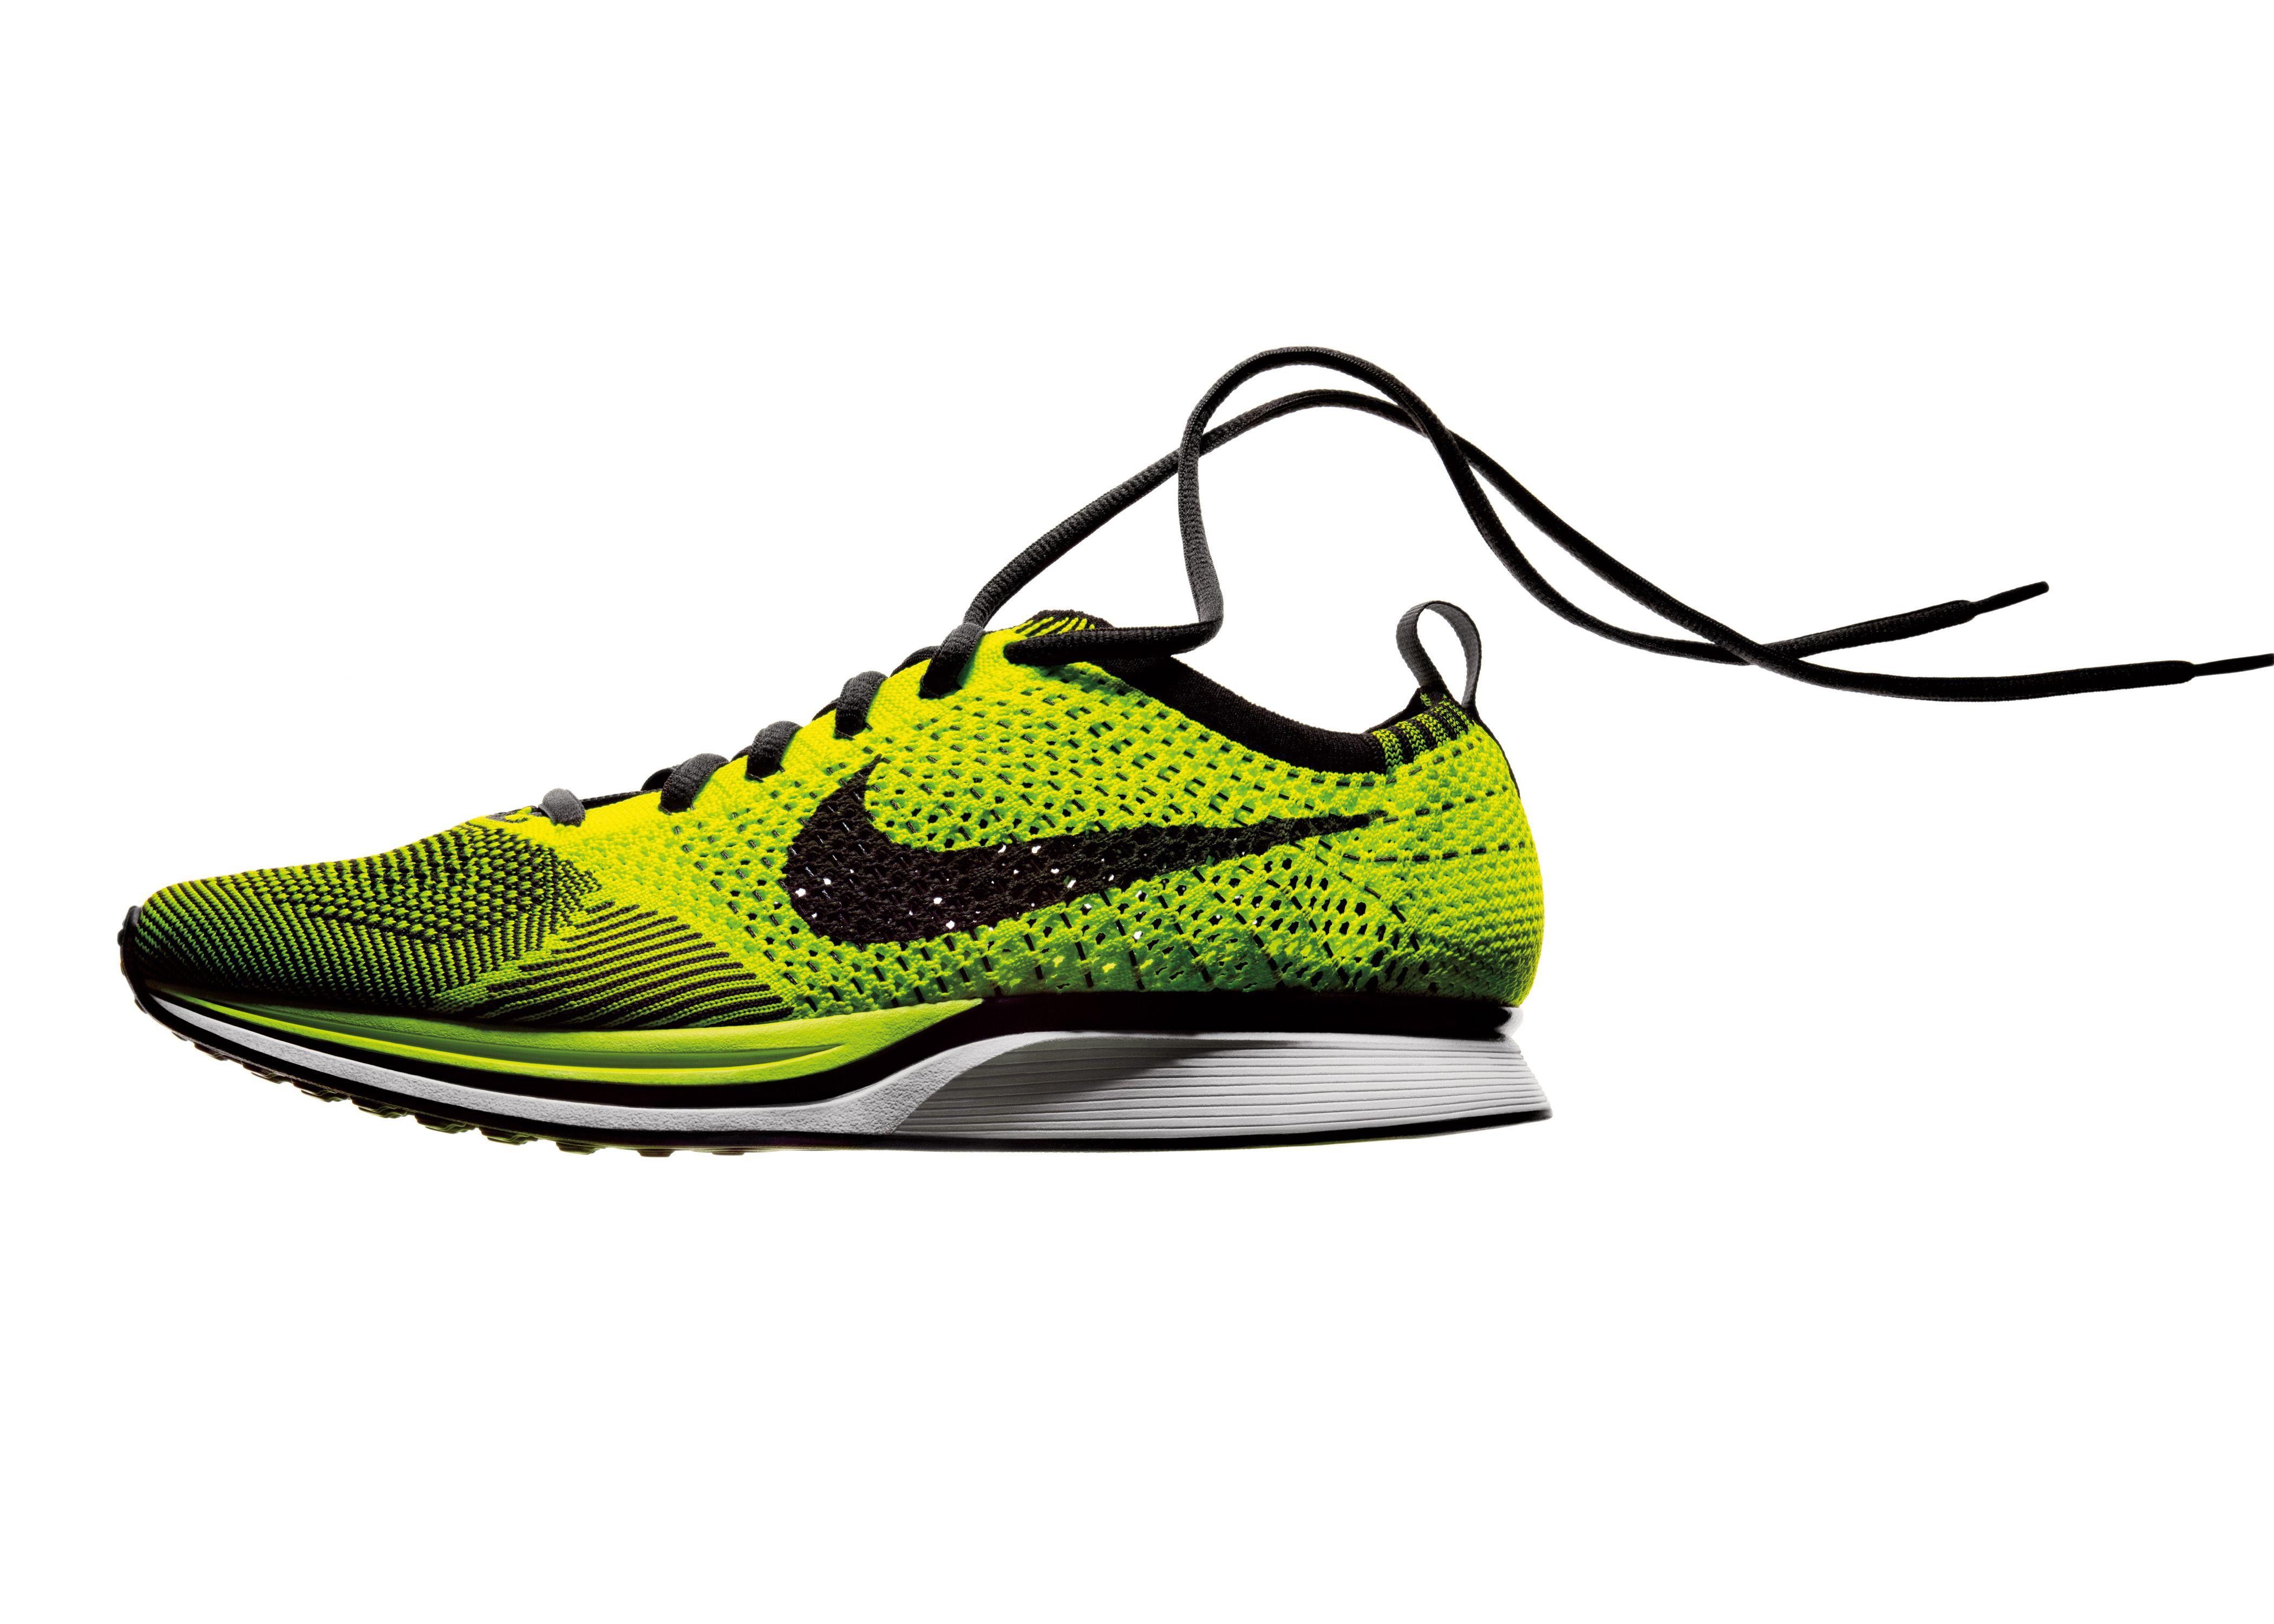 Lightest Nike Running Shoes | Nike